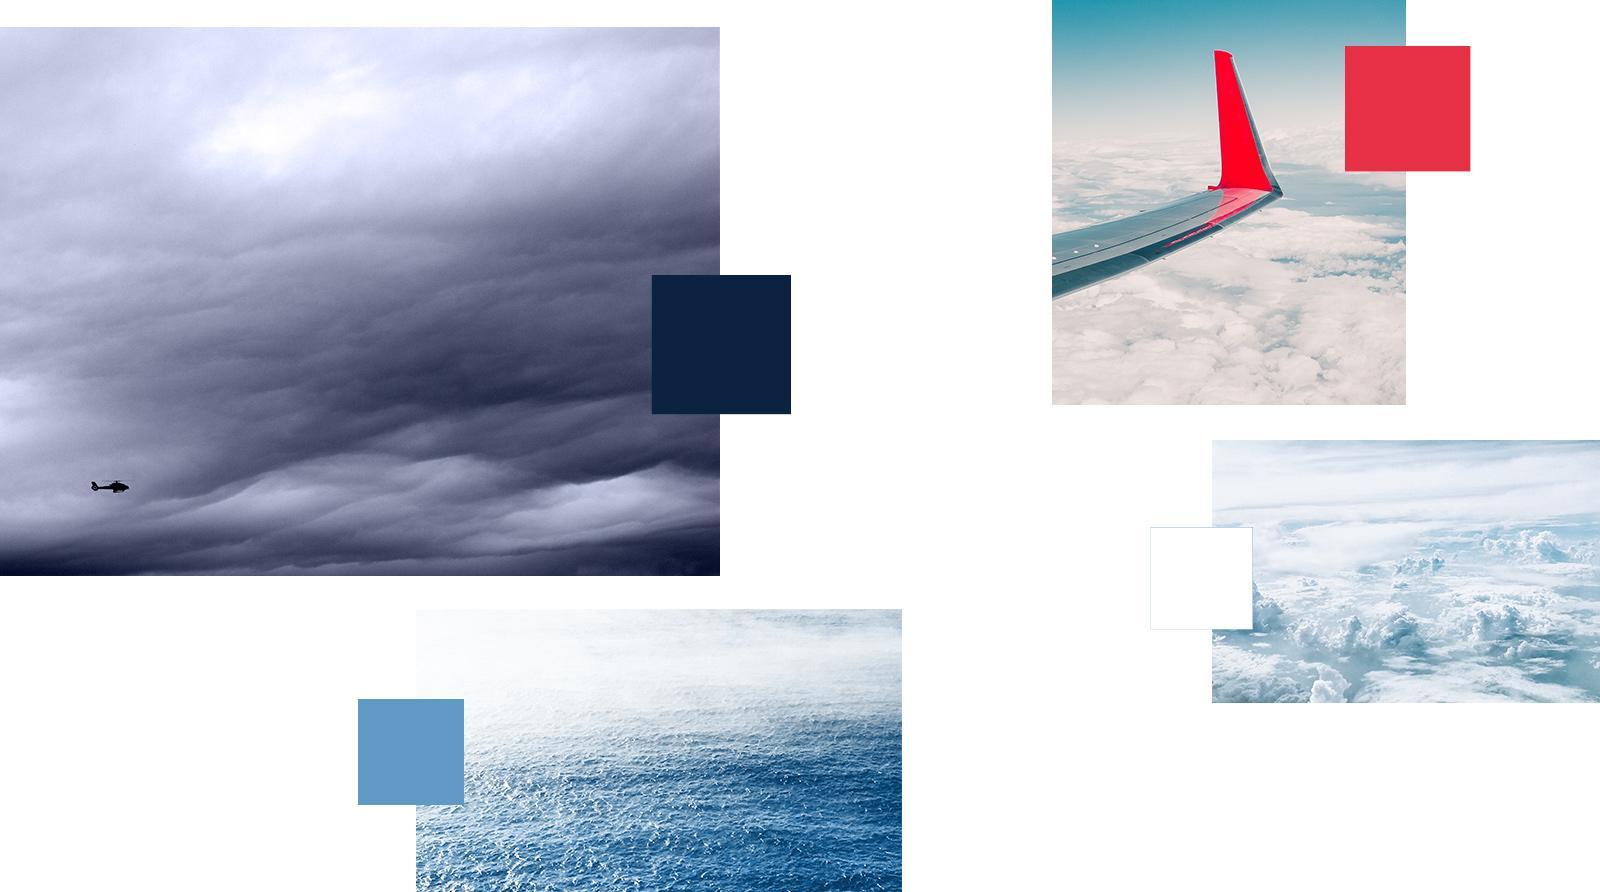 Farbwelt: Primärfarbe = Dunkelblau, Sekündarfarben = Hellblau und Weiß, Signalfarbe = Rot